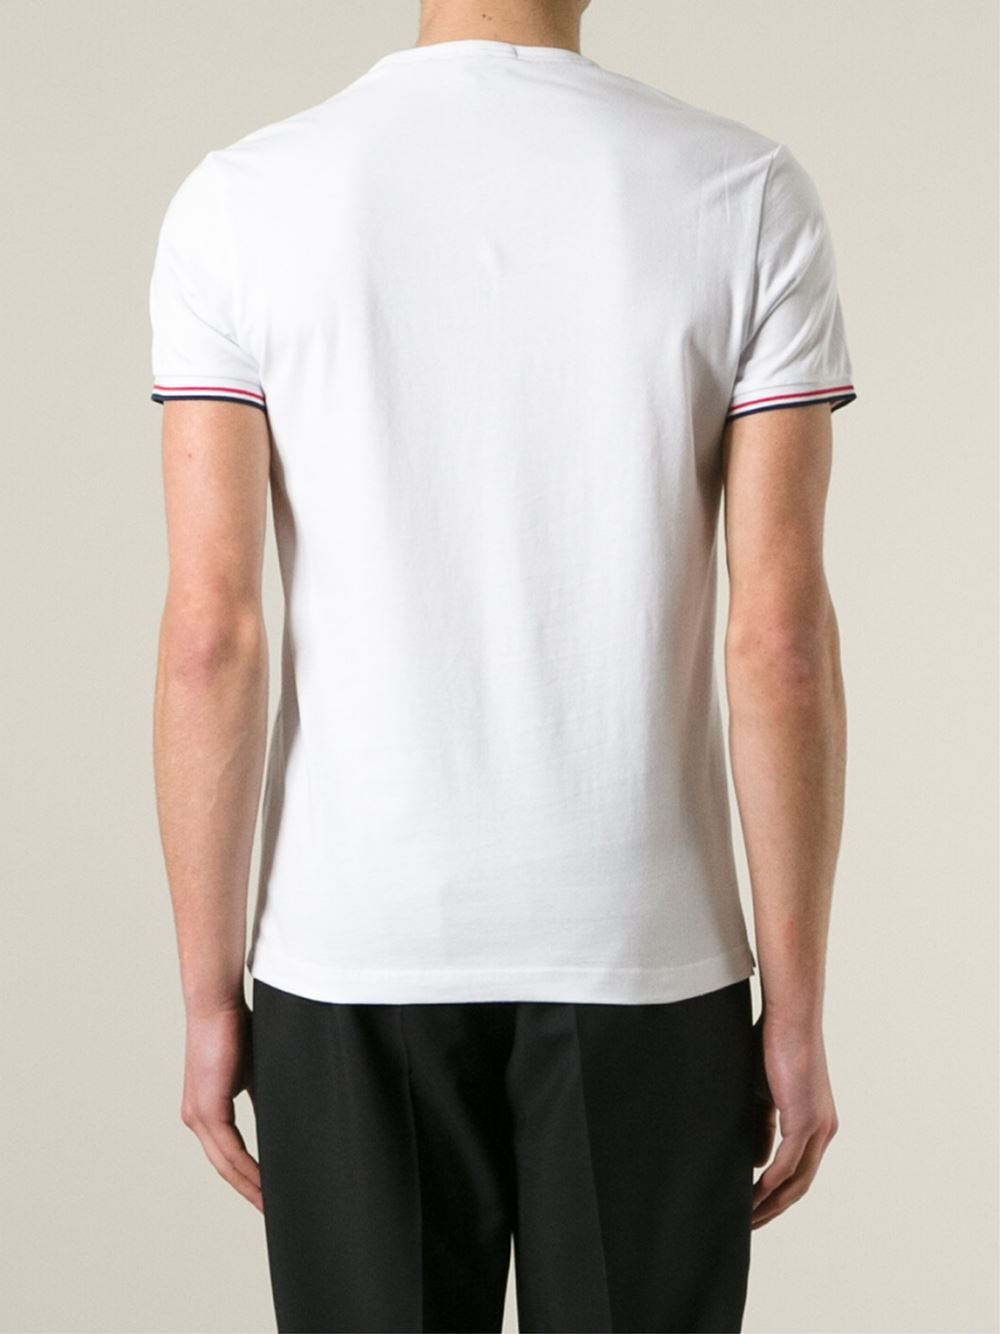 Lyst moncler crew neck t shirt in white for men for Off white moncler t shirt